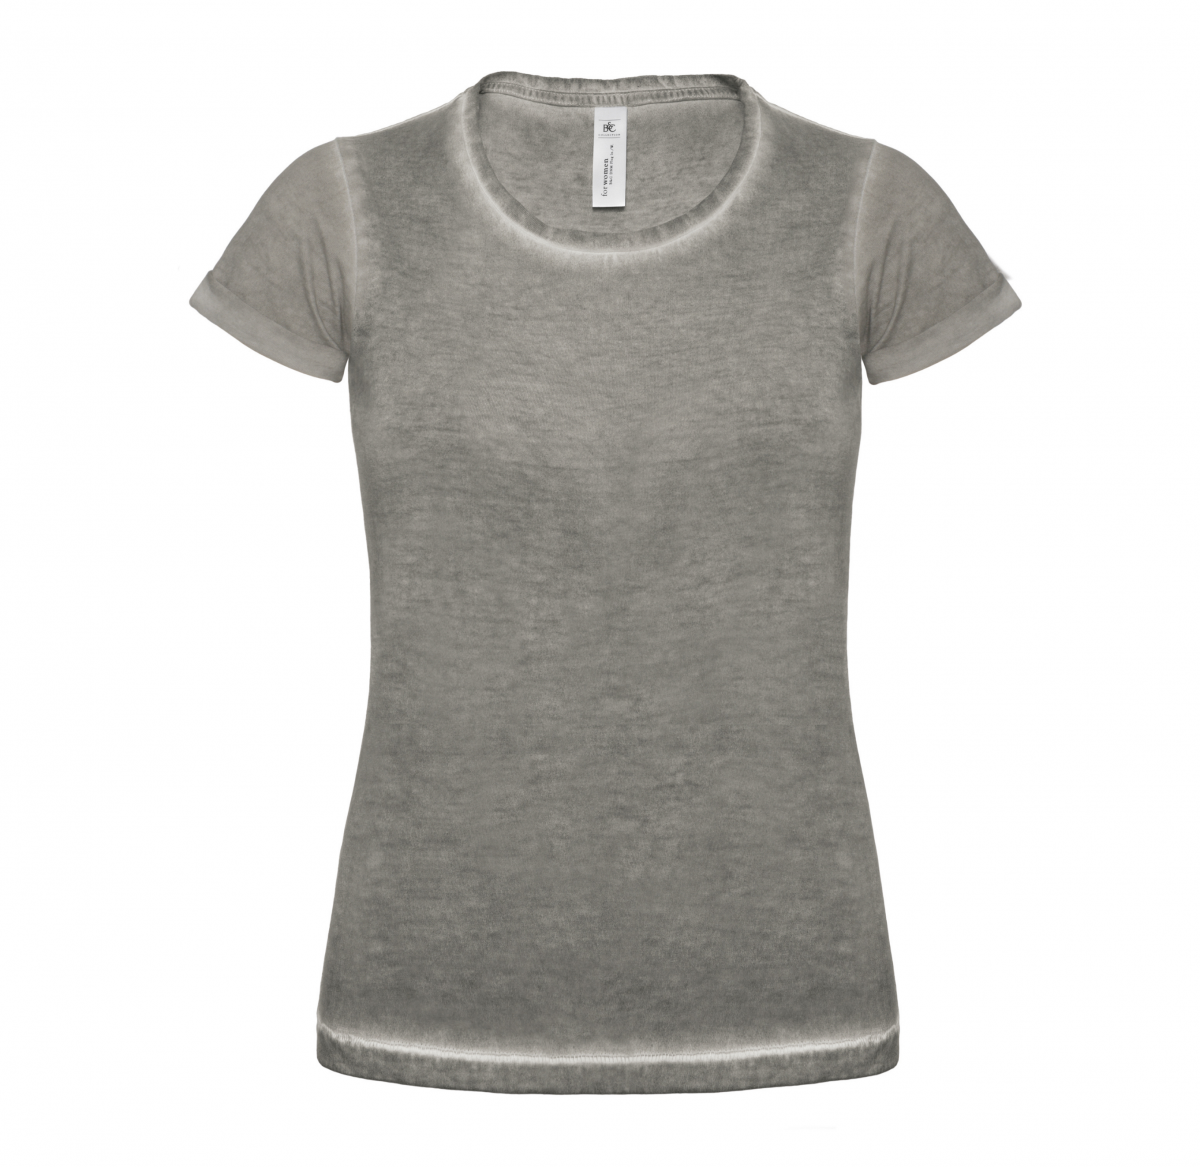 Tee-Shirt Femme Vintage - Gris